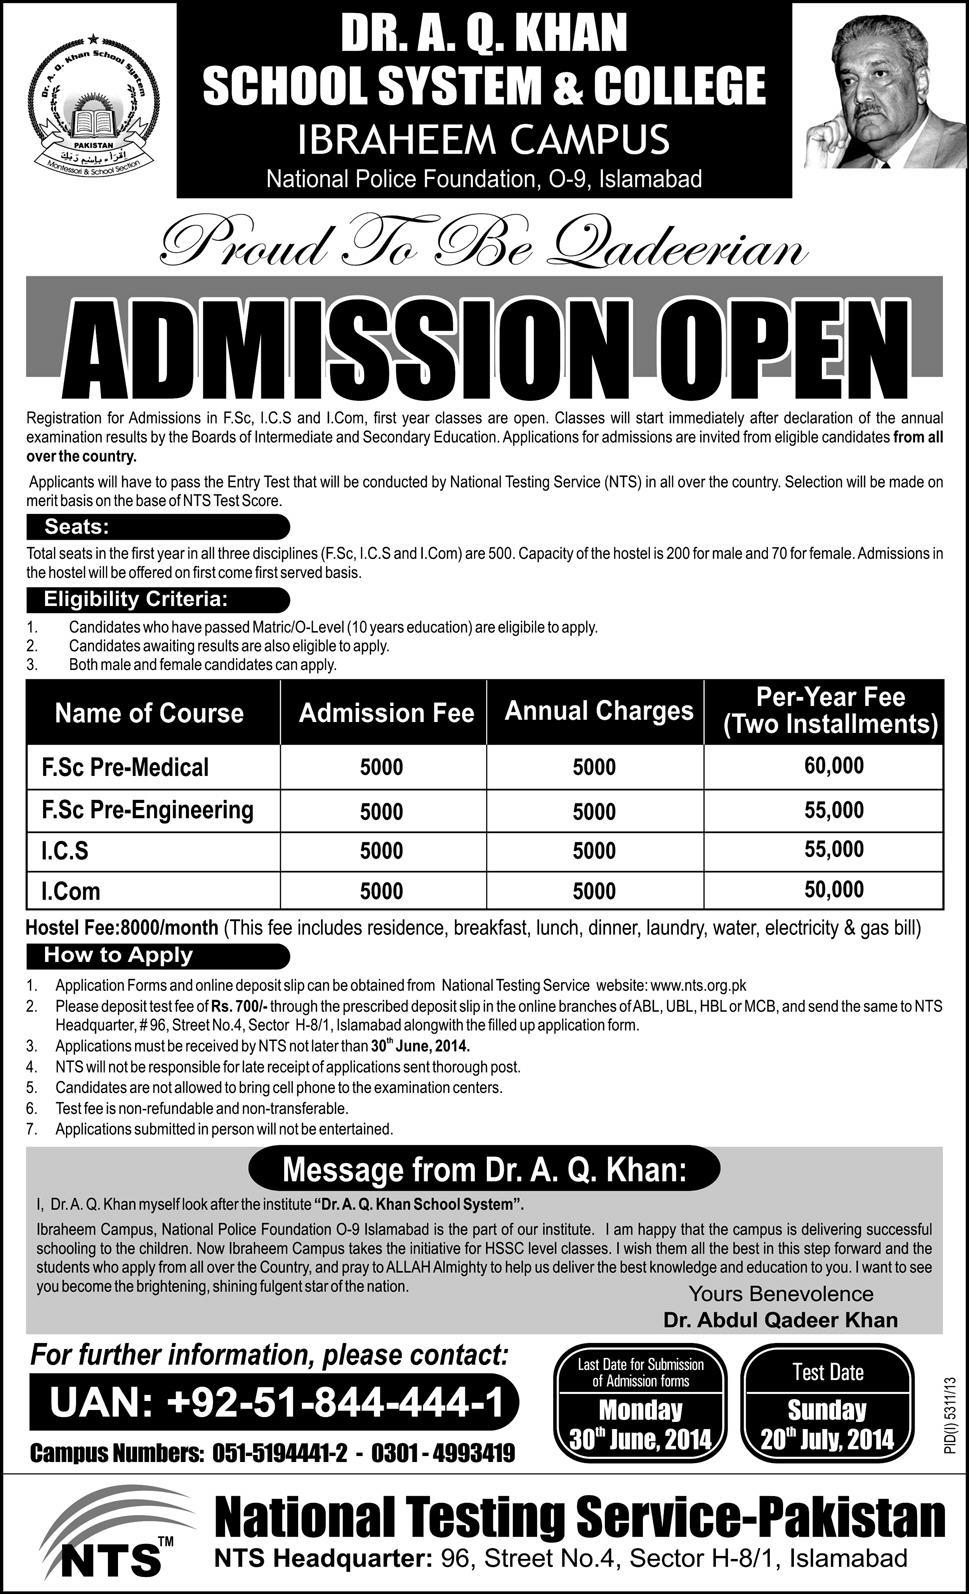 Ou phd online application form 2014